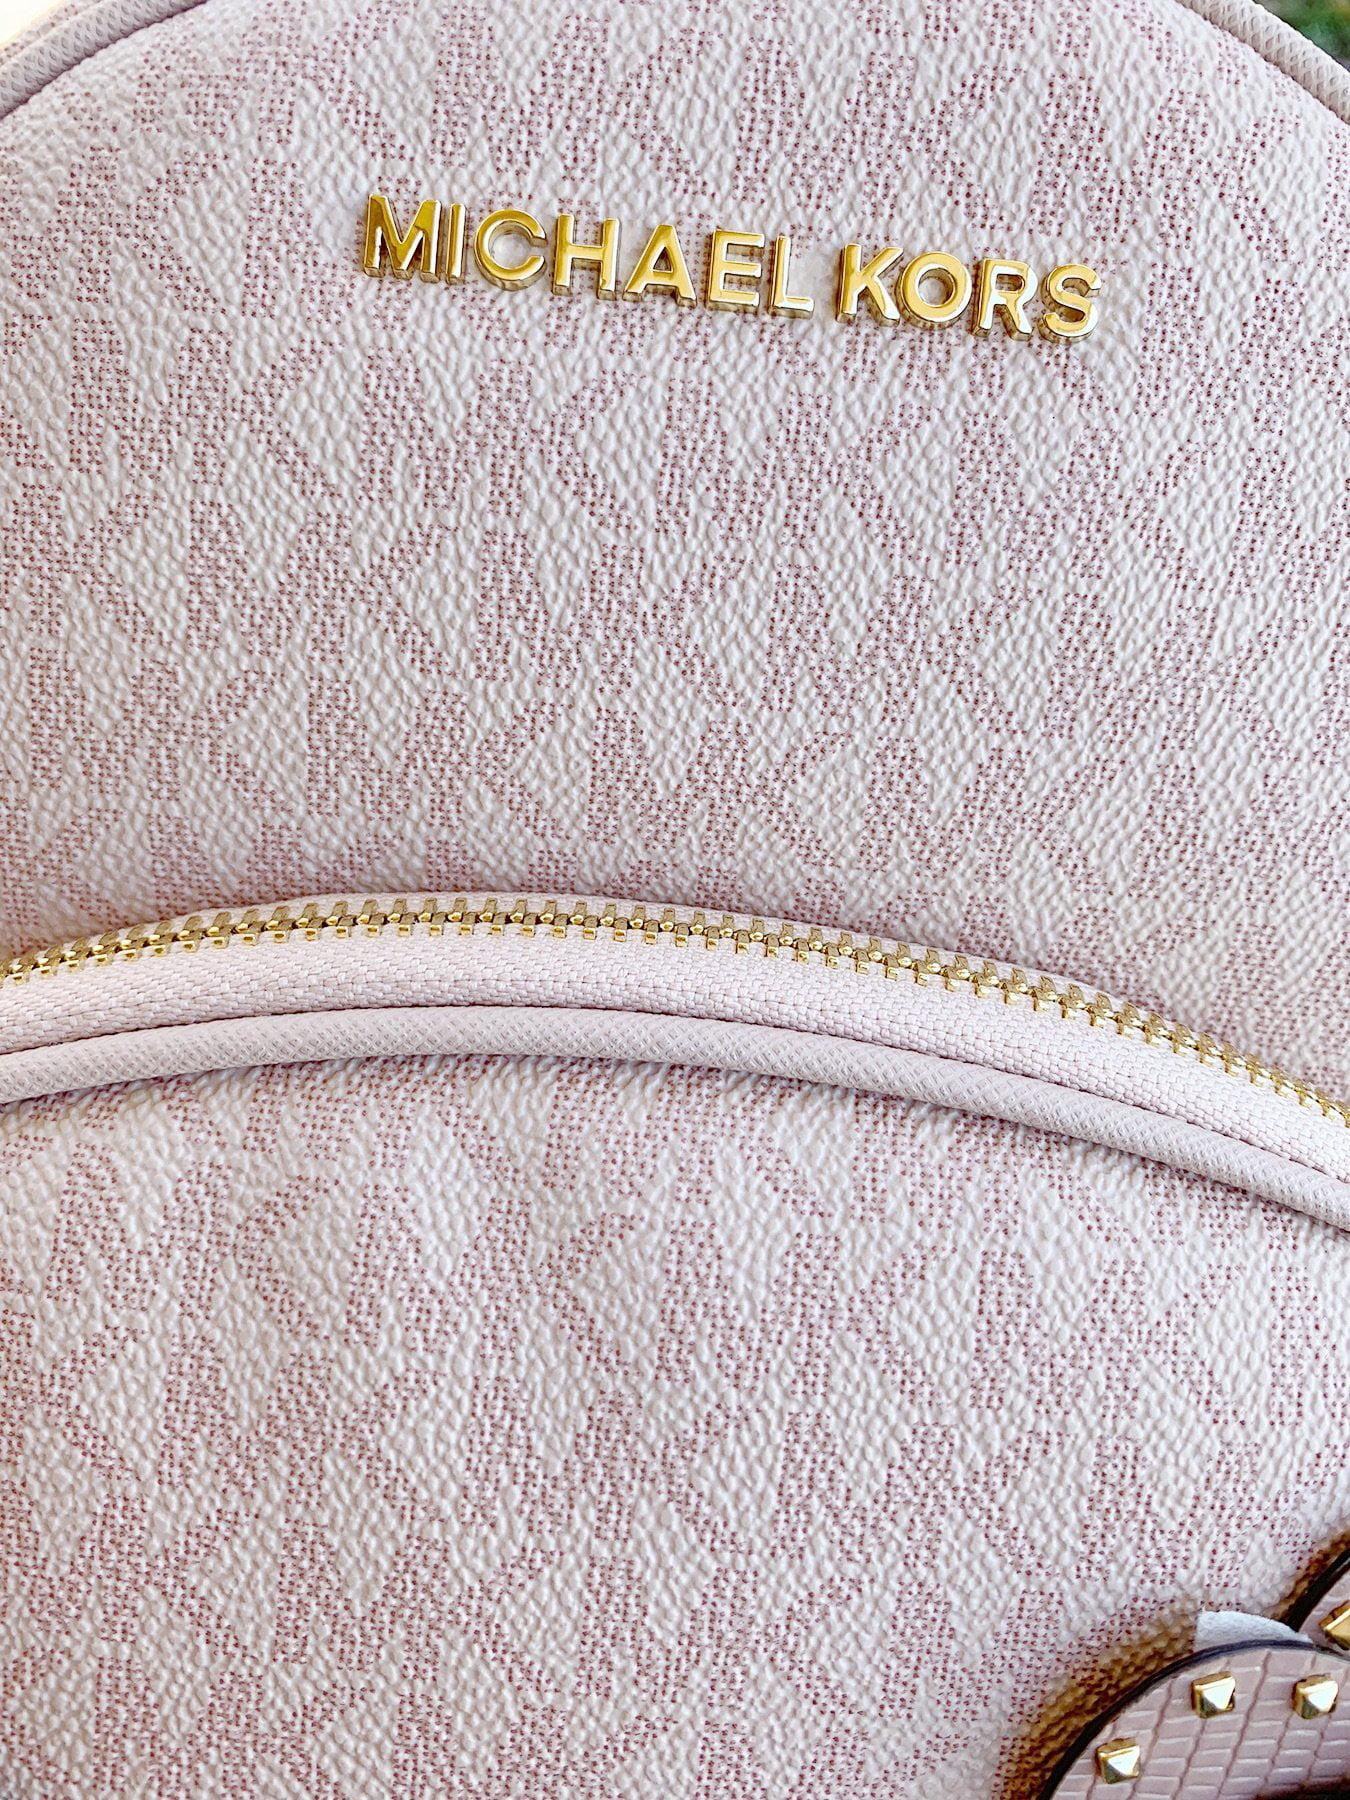 a1959277fafc Michael Kors - Michael Kors Abbey Medium Backpack Ballet Pink MK Signature  Flower School Bag - Walmart.com